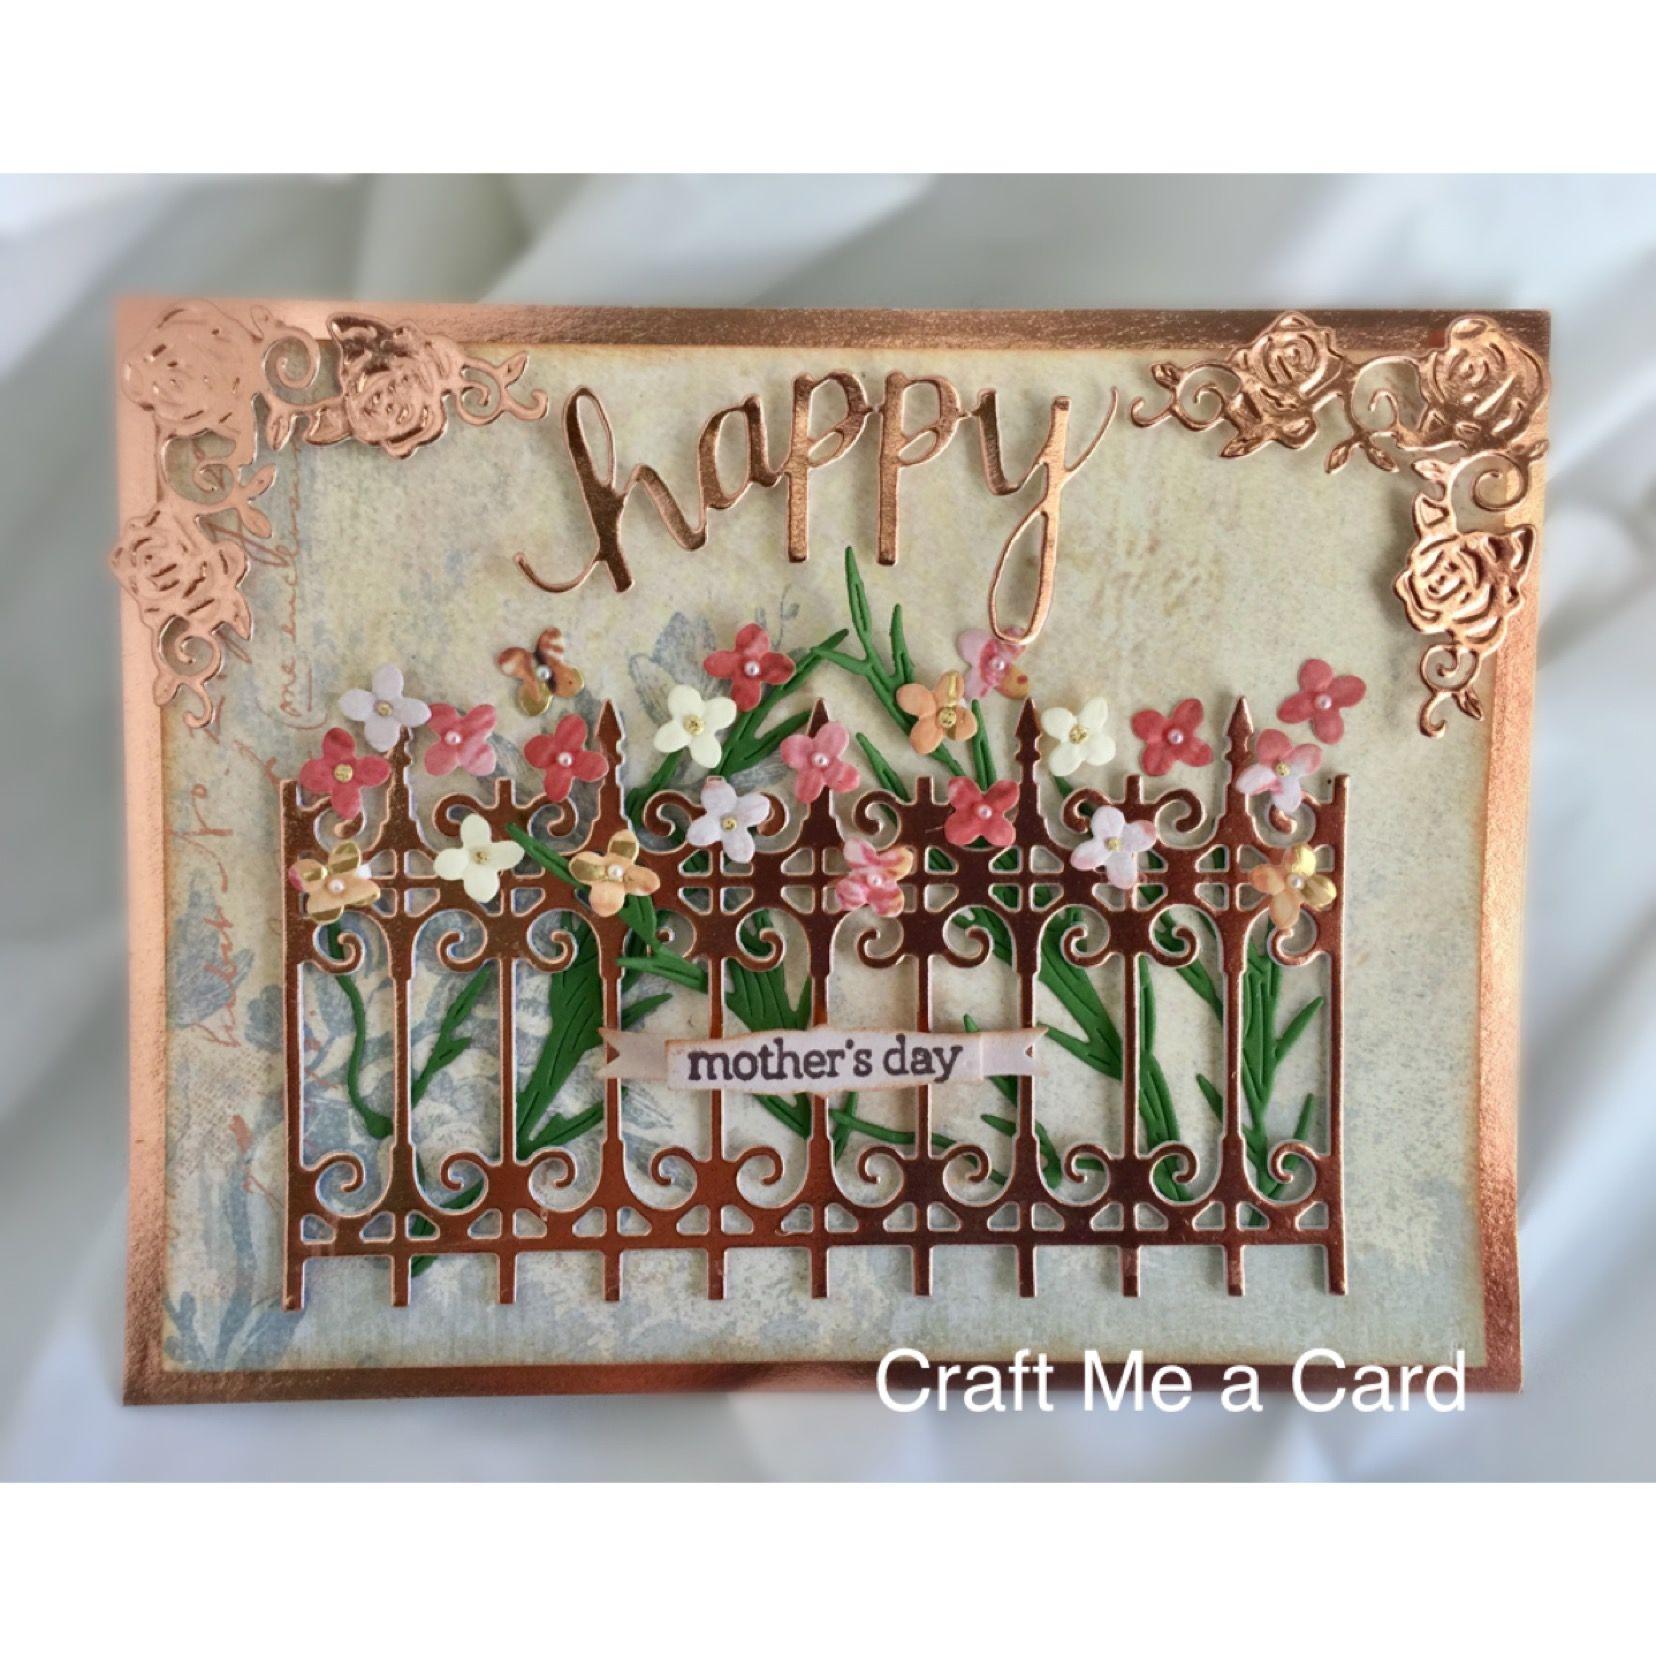 Beautiful handmade mothers day card garden with flowers die cut beautiful handmade mothers day card garden with flowers die cut made by craft izmirmasajfo